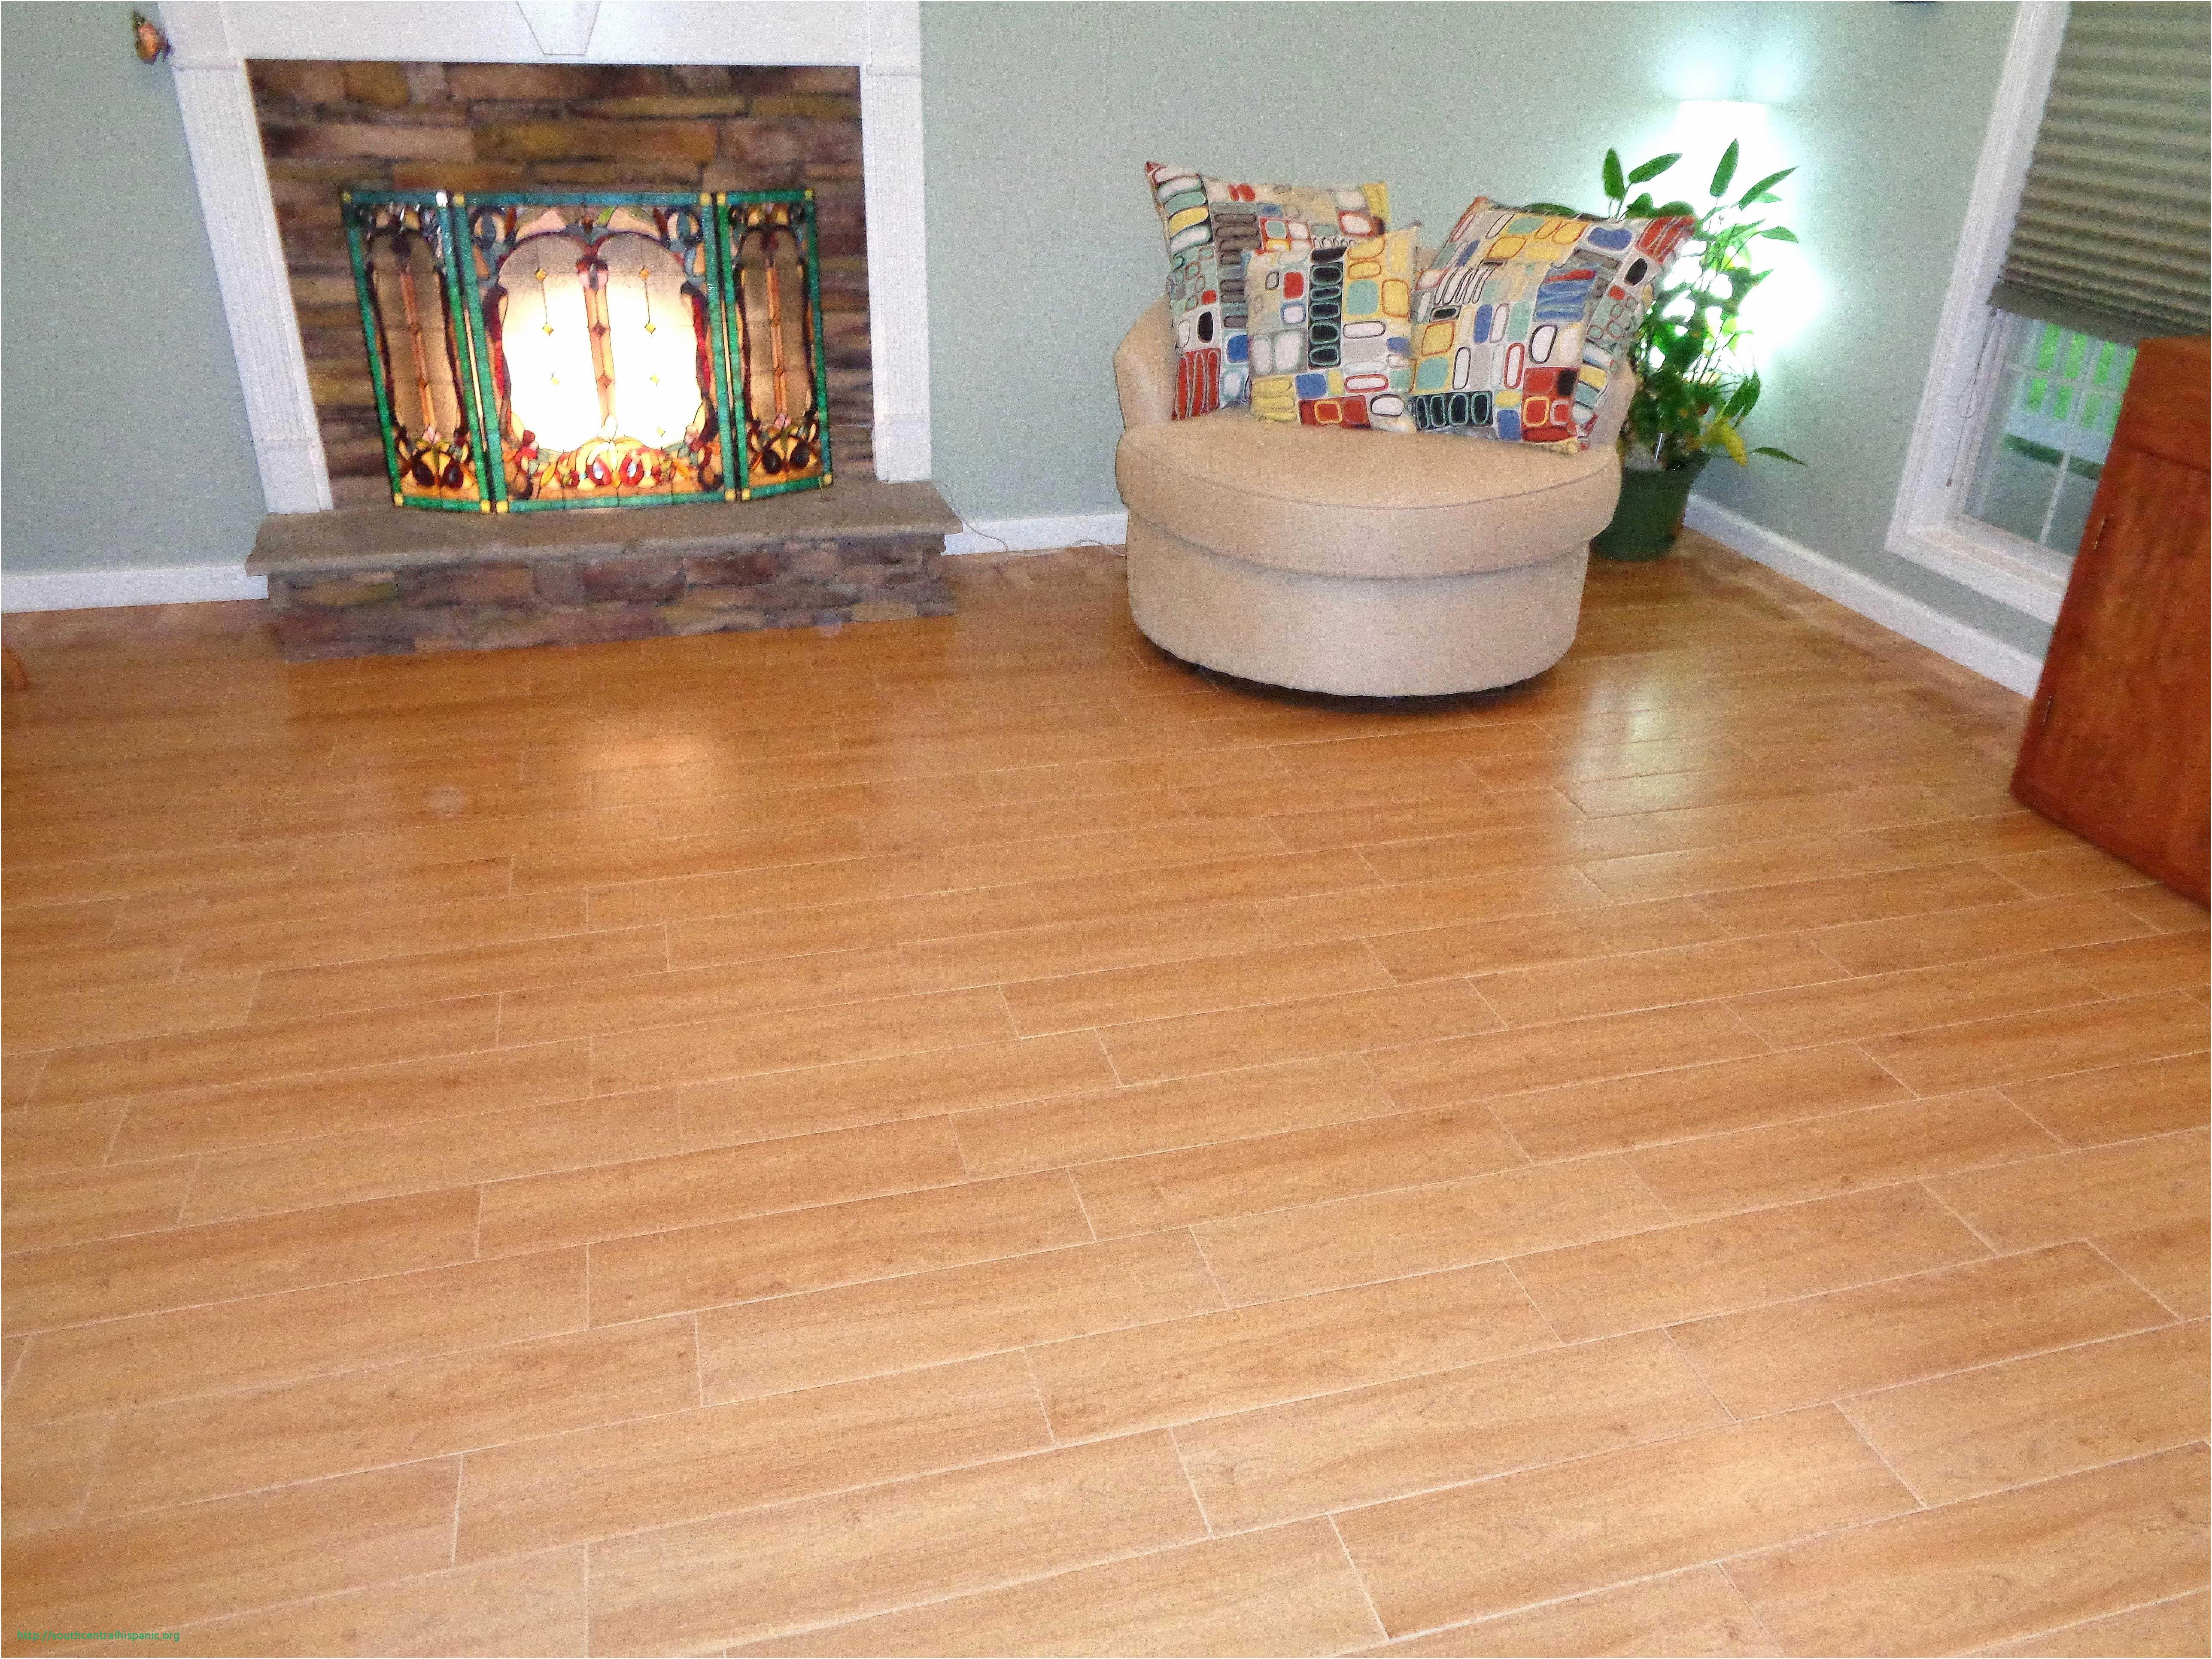 laminate vs prefinished hardwood flooring of 25 meilleur de hardwood flooring discount warehouse ideas blog throughout best laminate flooring best laminate wood flooring unique woodfloor warehouse 0d beautiful